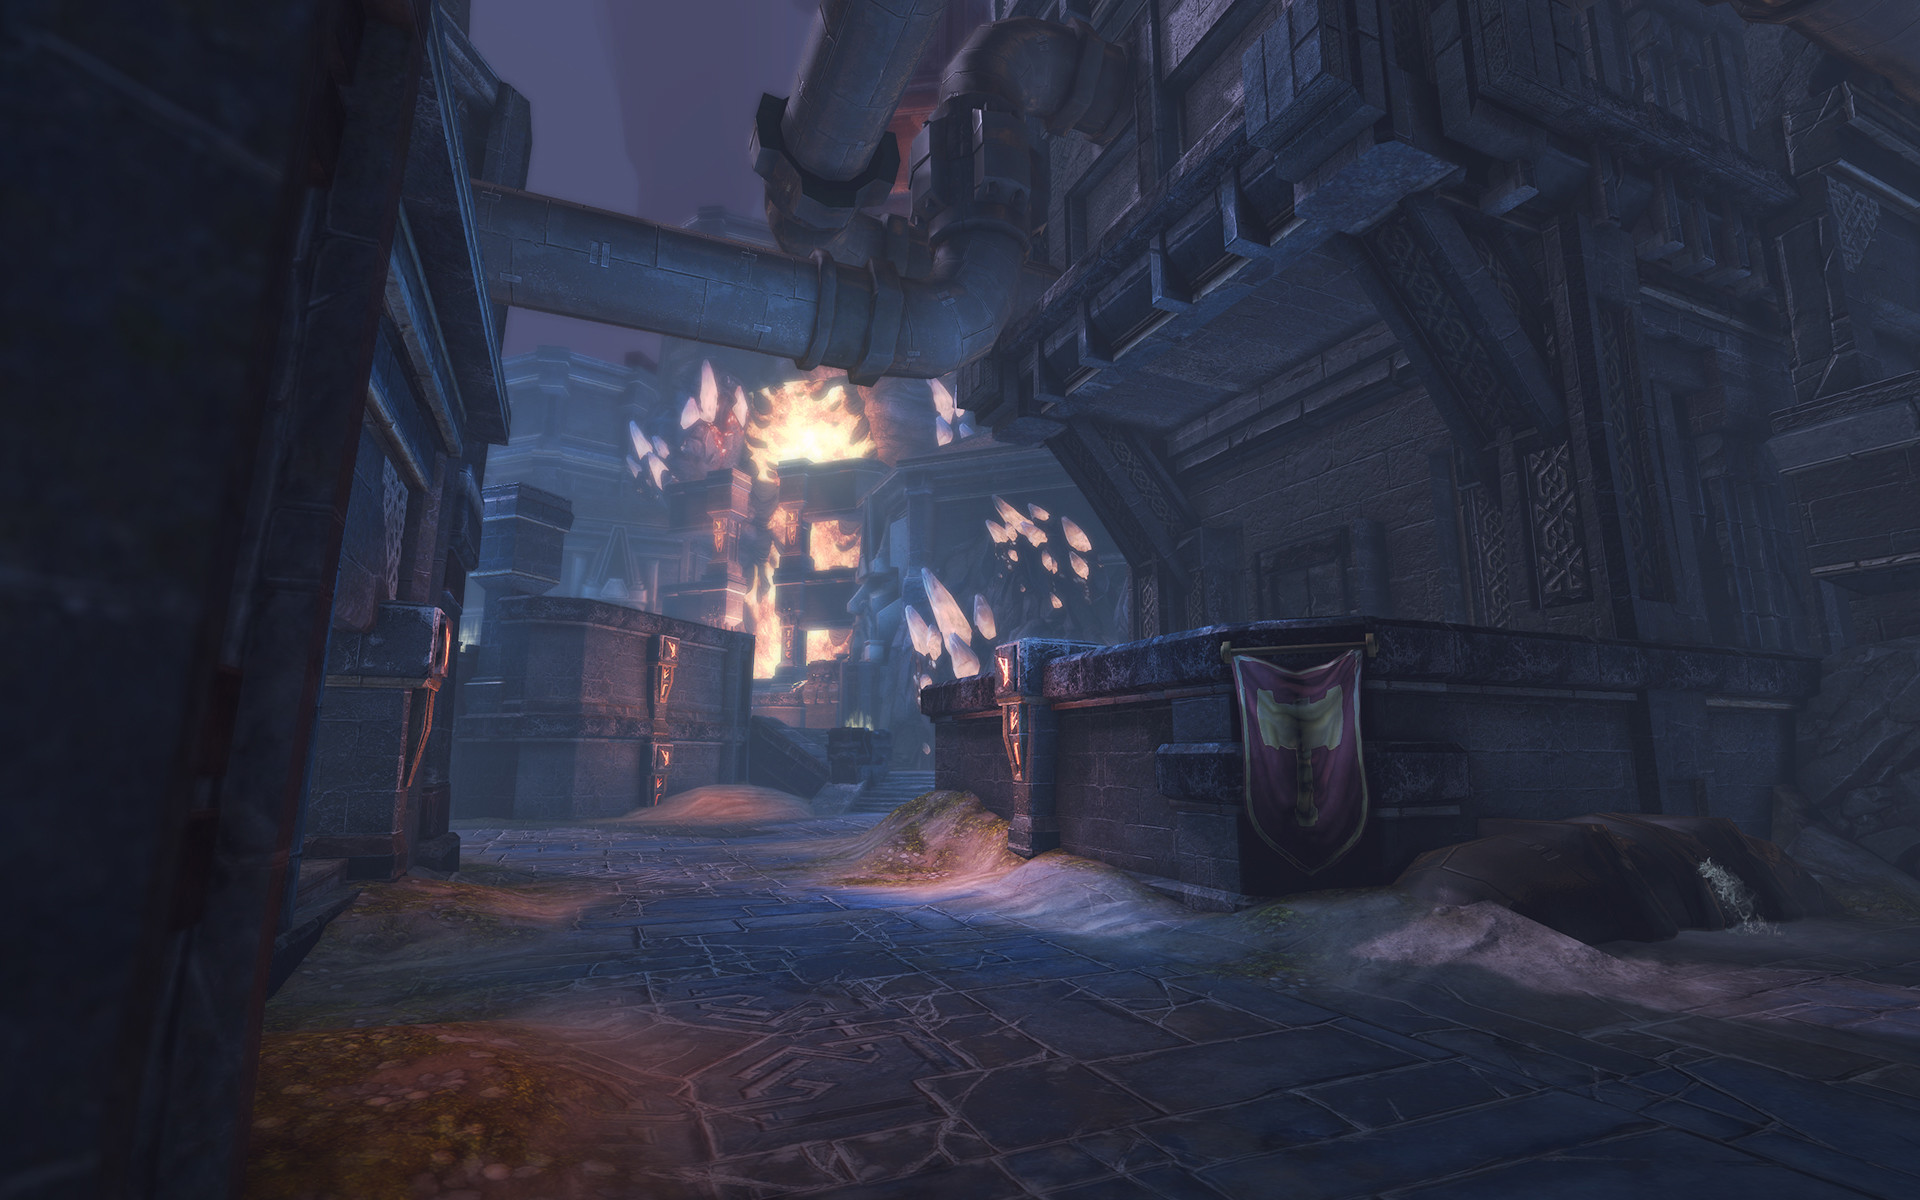 ArtStation - Neverwinter Online: Dungeons & Dragons, Jason